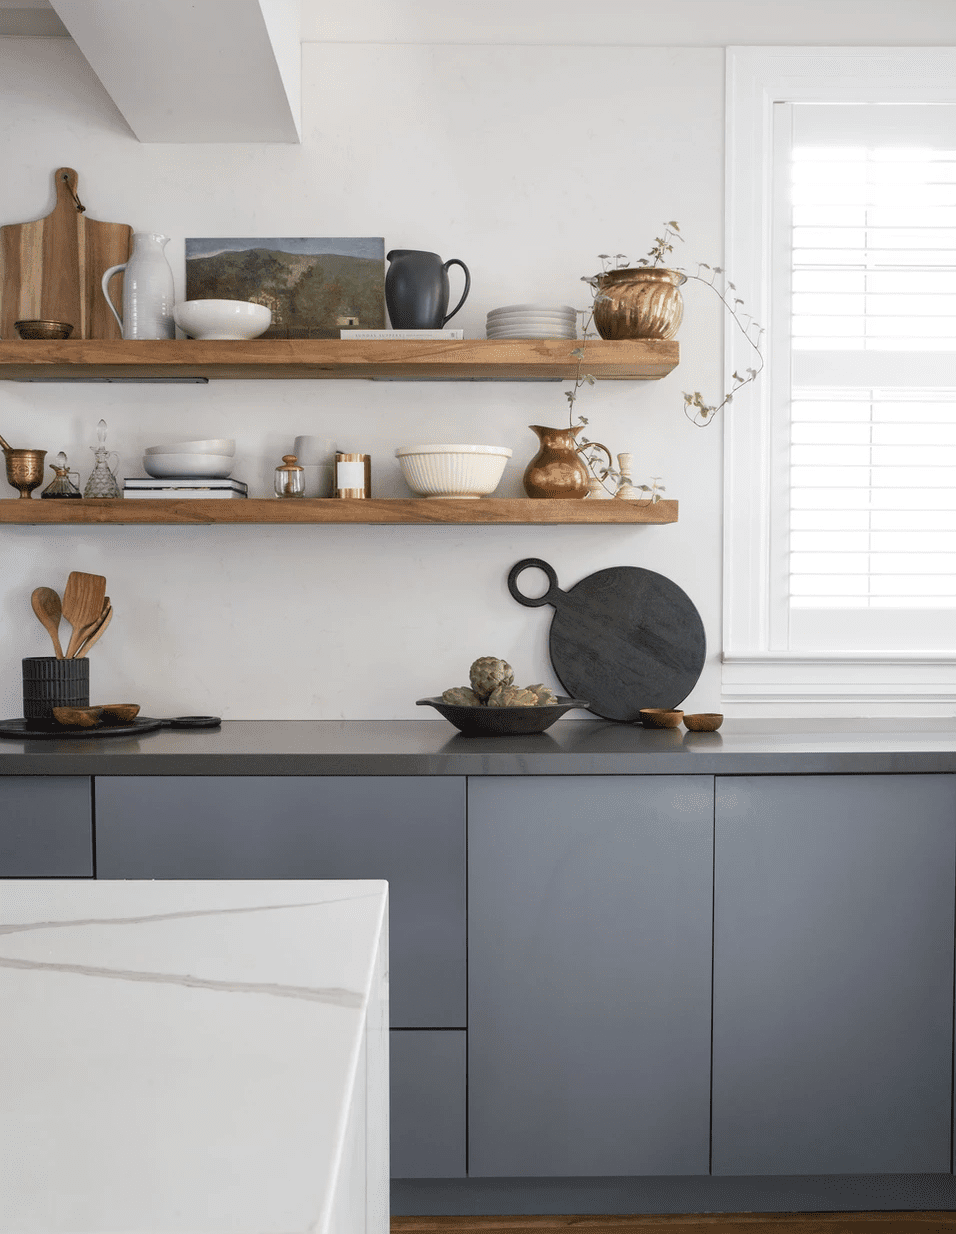 A minimalist kitchen with crisp white walls